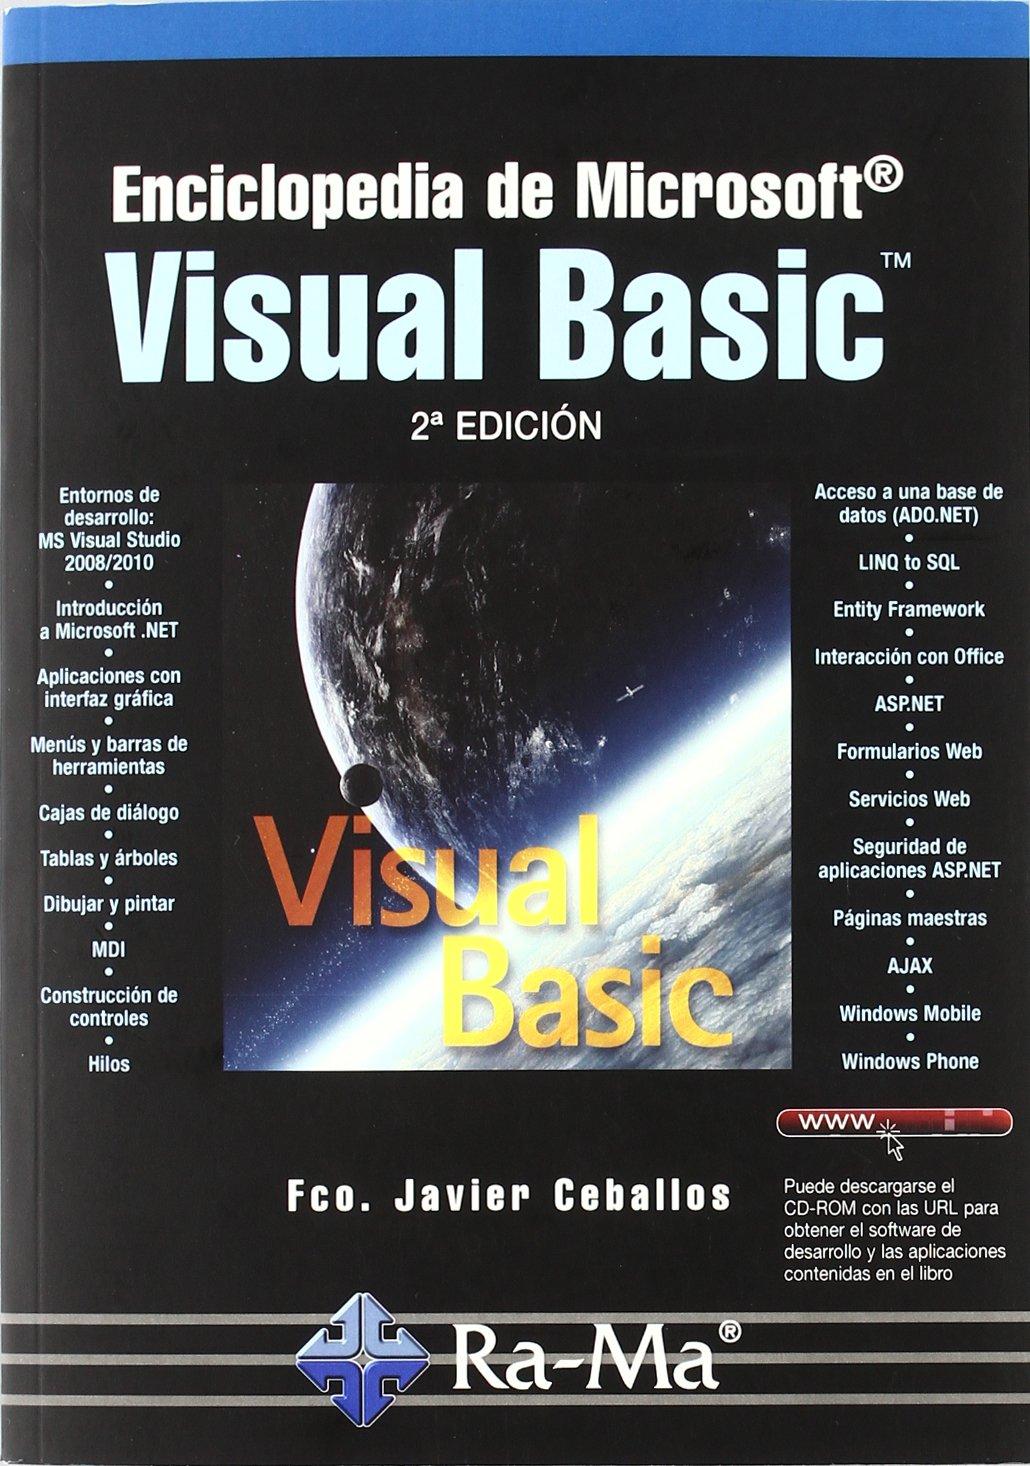 Enciclopedia de Microsoft Visual Basic. 2ª edición (Spanish) Paperback – January 1, 2008